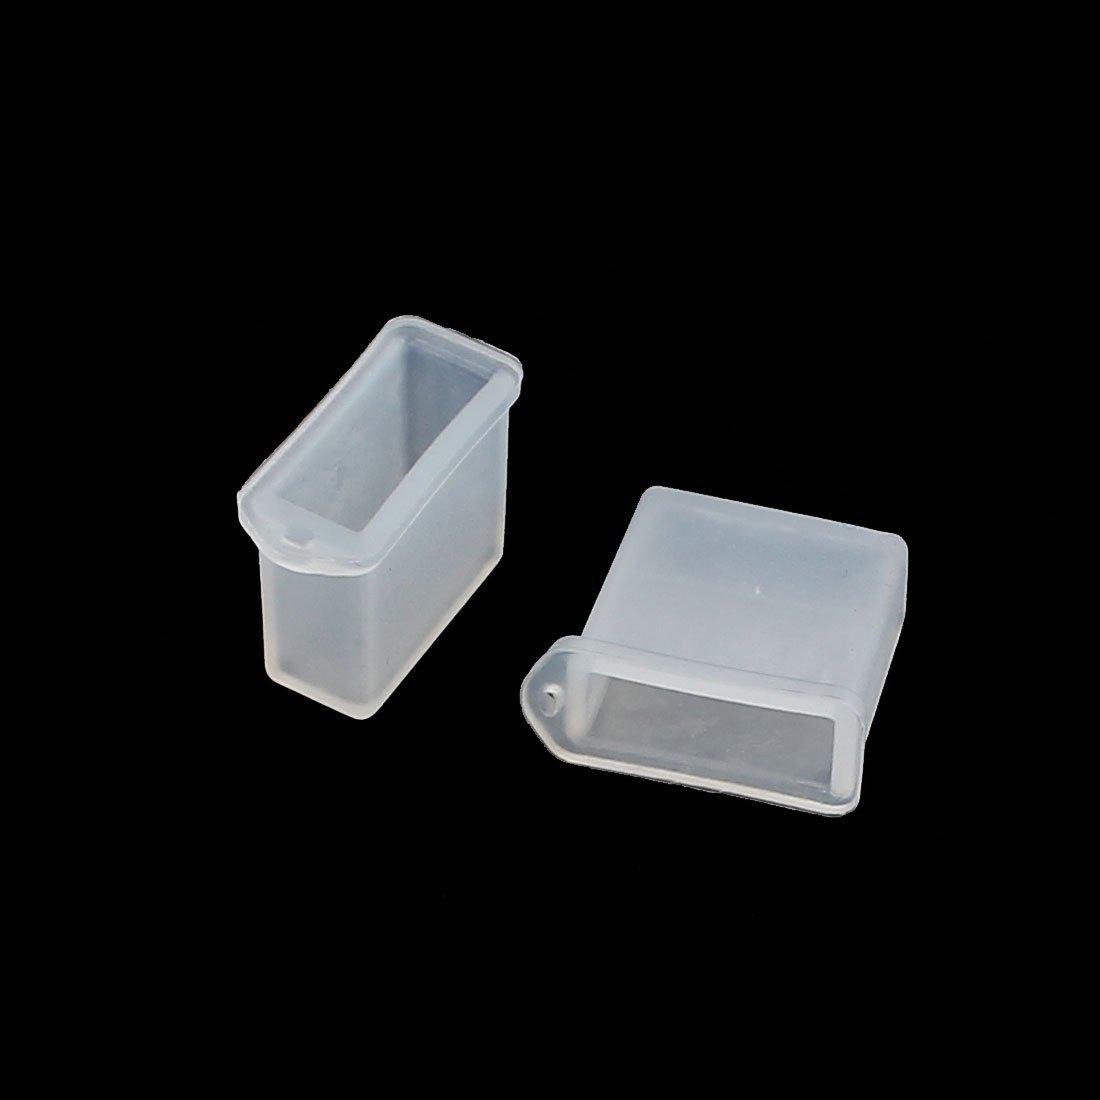 Amazon.com: Masculino DealMux 20Pcs Limpar poeira plástico Capa Para Digital Produto USB Connector A2: Electronics